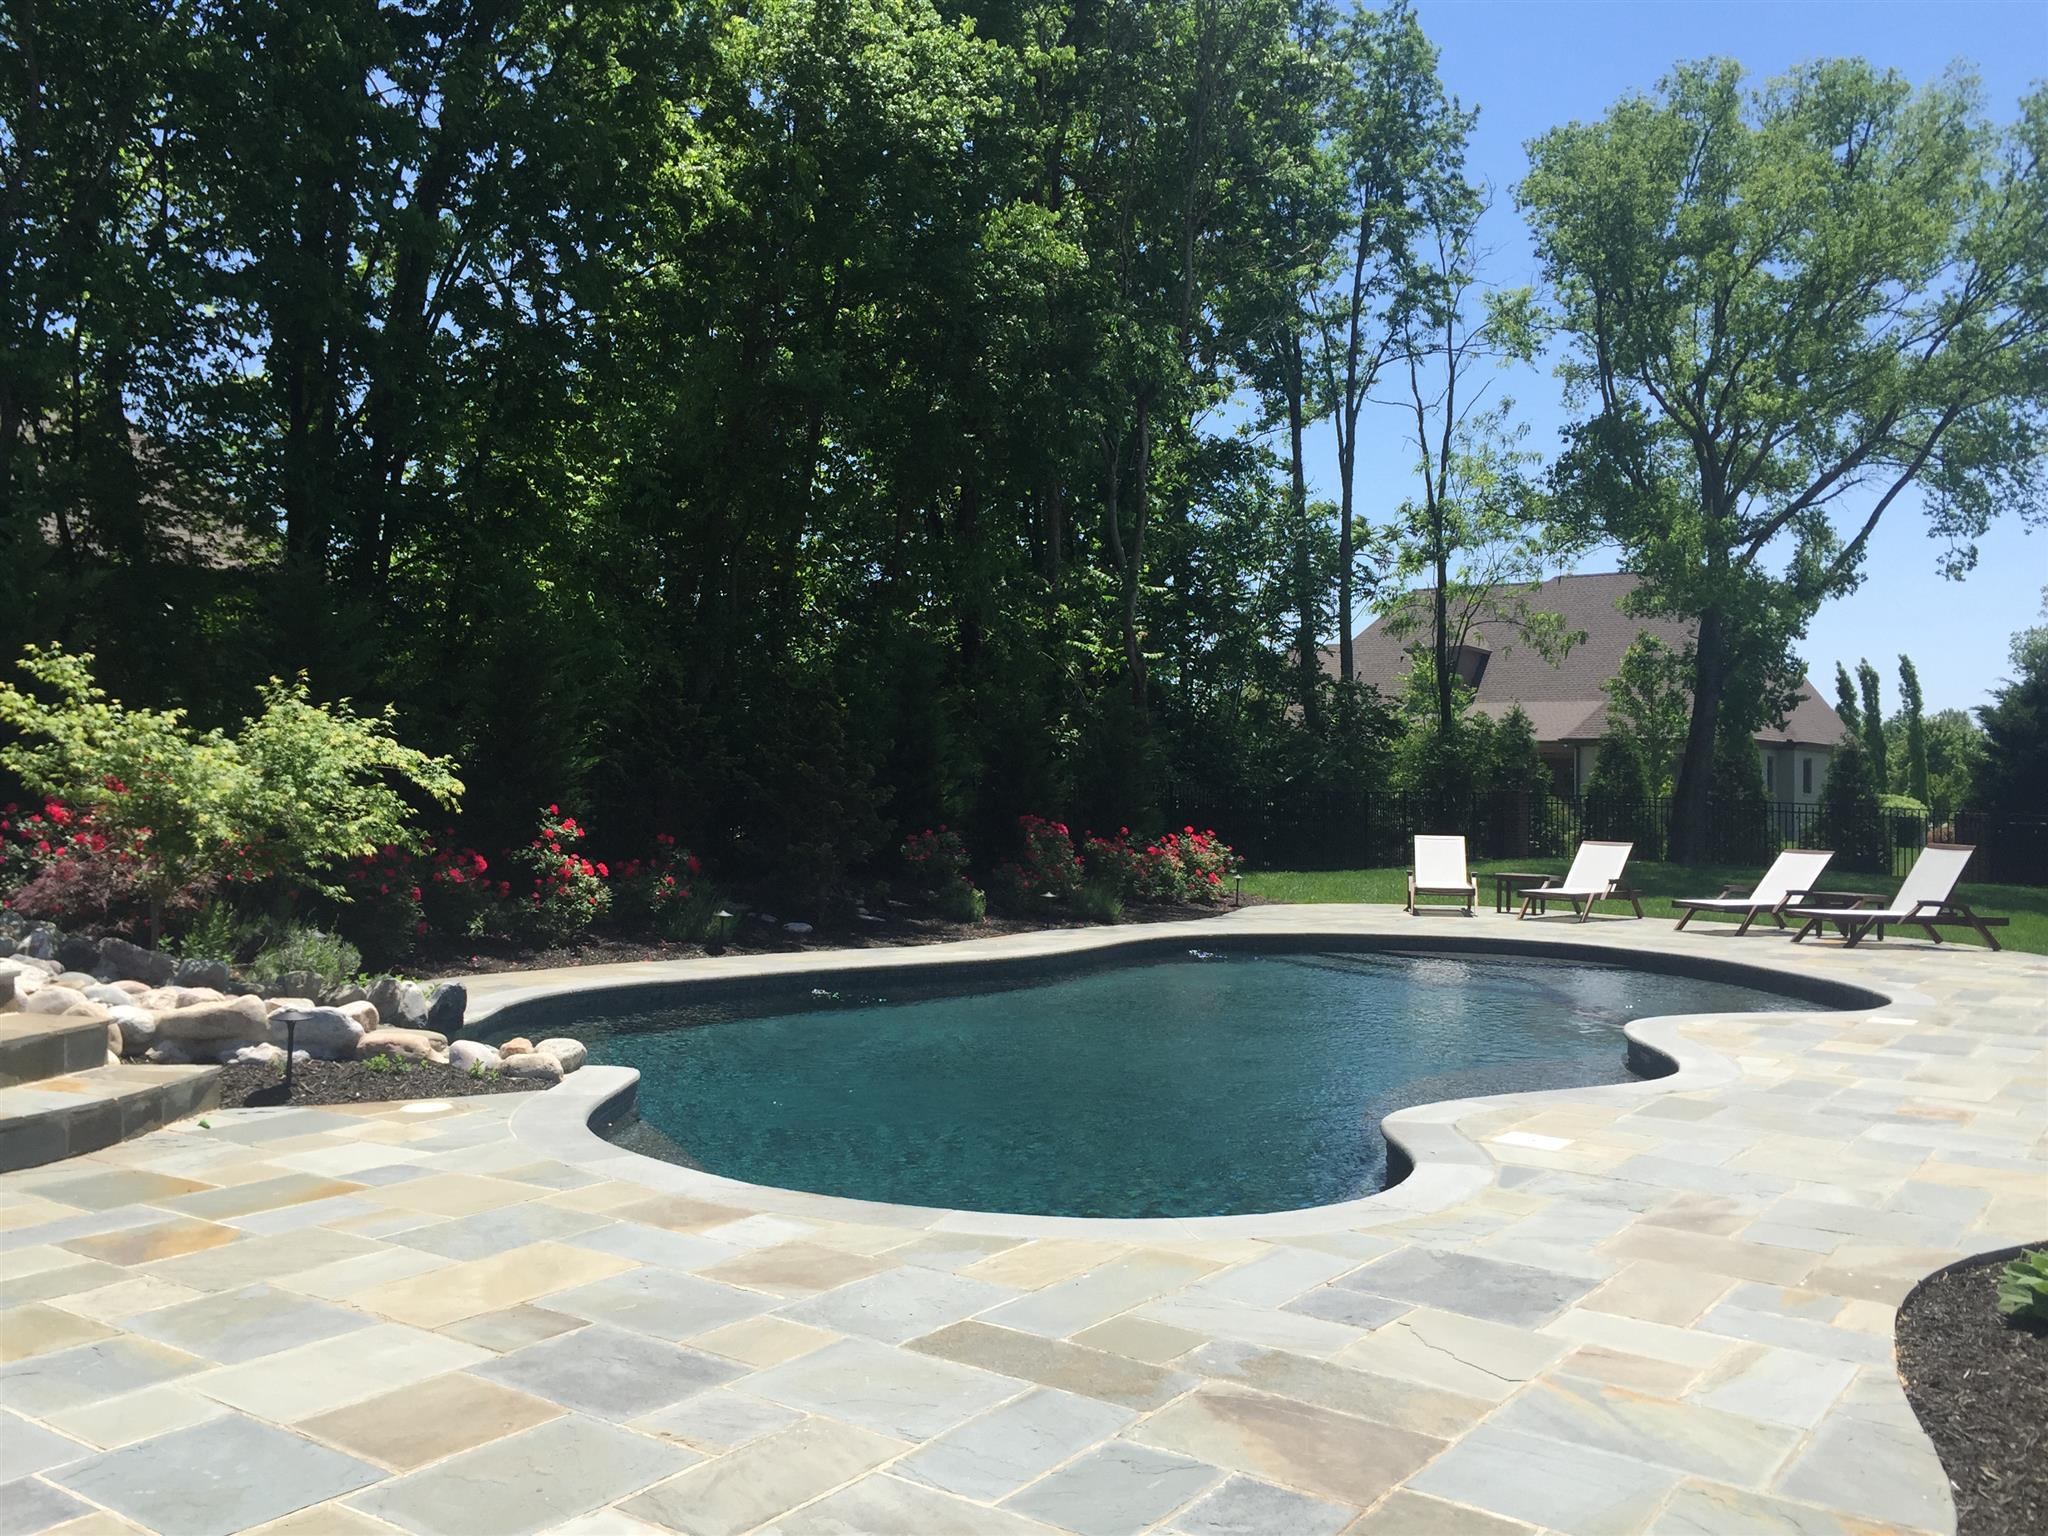 126 Patricia Lee Ct, Franklin, TN 37069 - Franklin, TN real estate listing